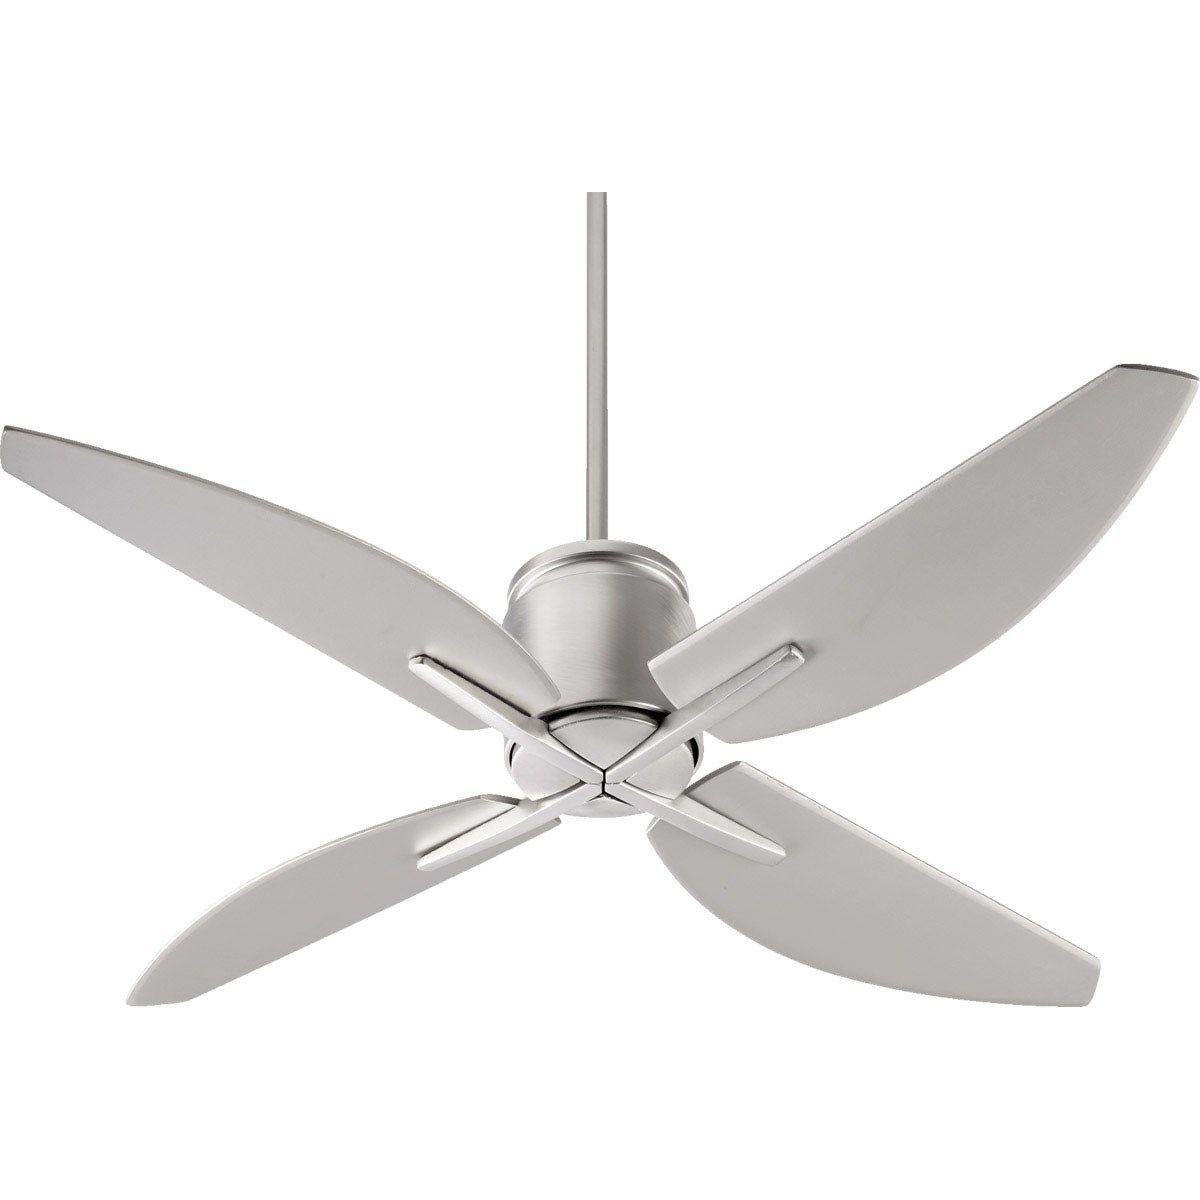 Quorum International 50524 65 Kai Contemporary Ceiling Fan